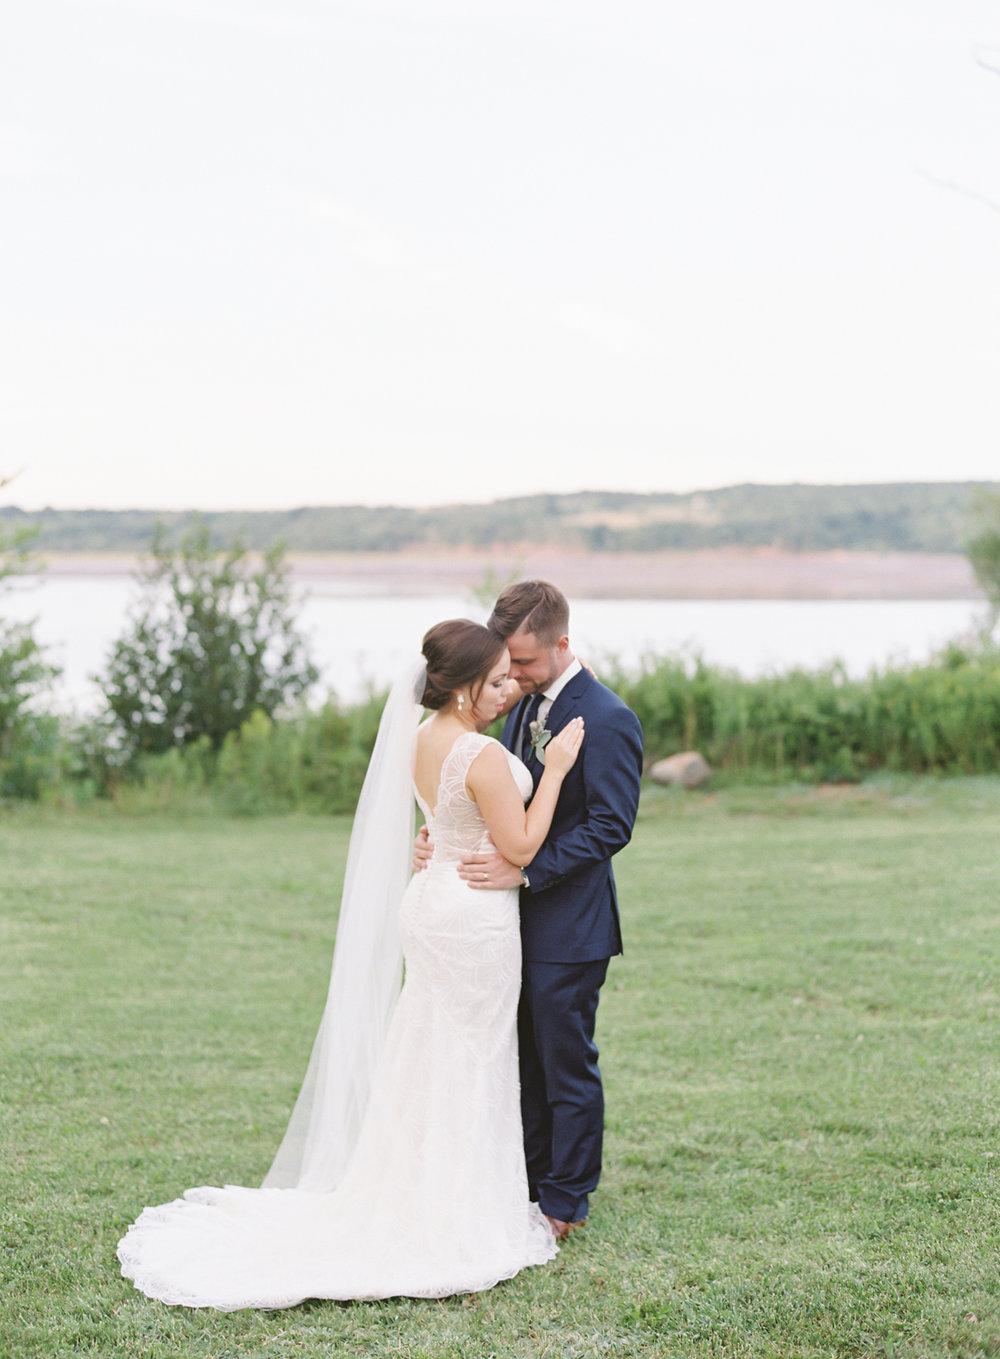 Jacqueline Anne Photography - Nova Scotia Backyard Wedding-87.jpg